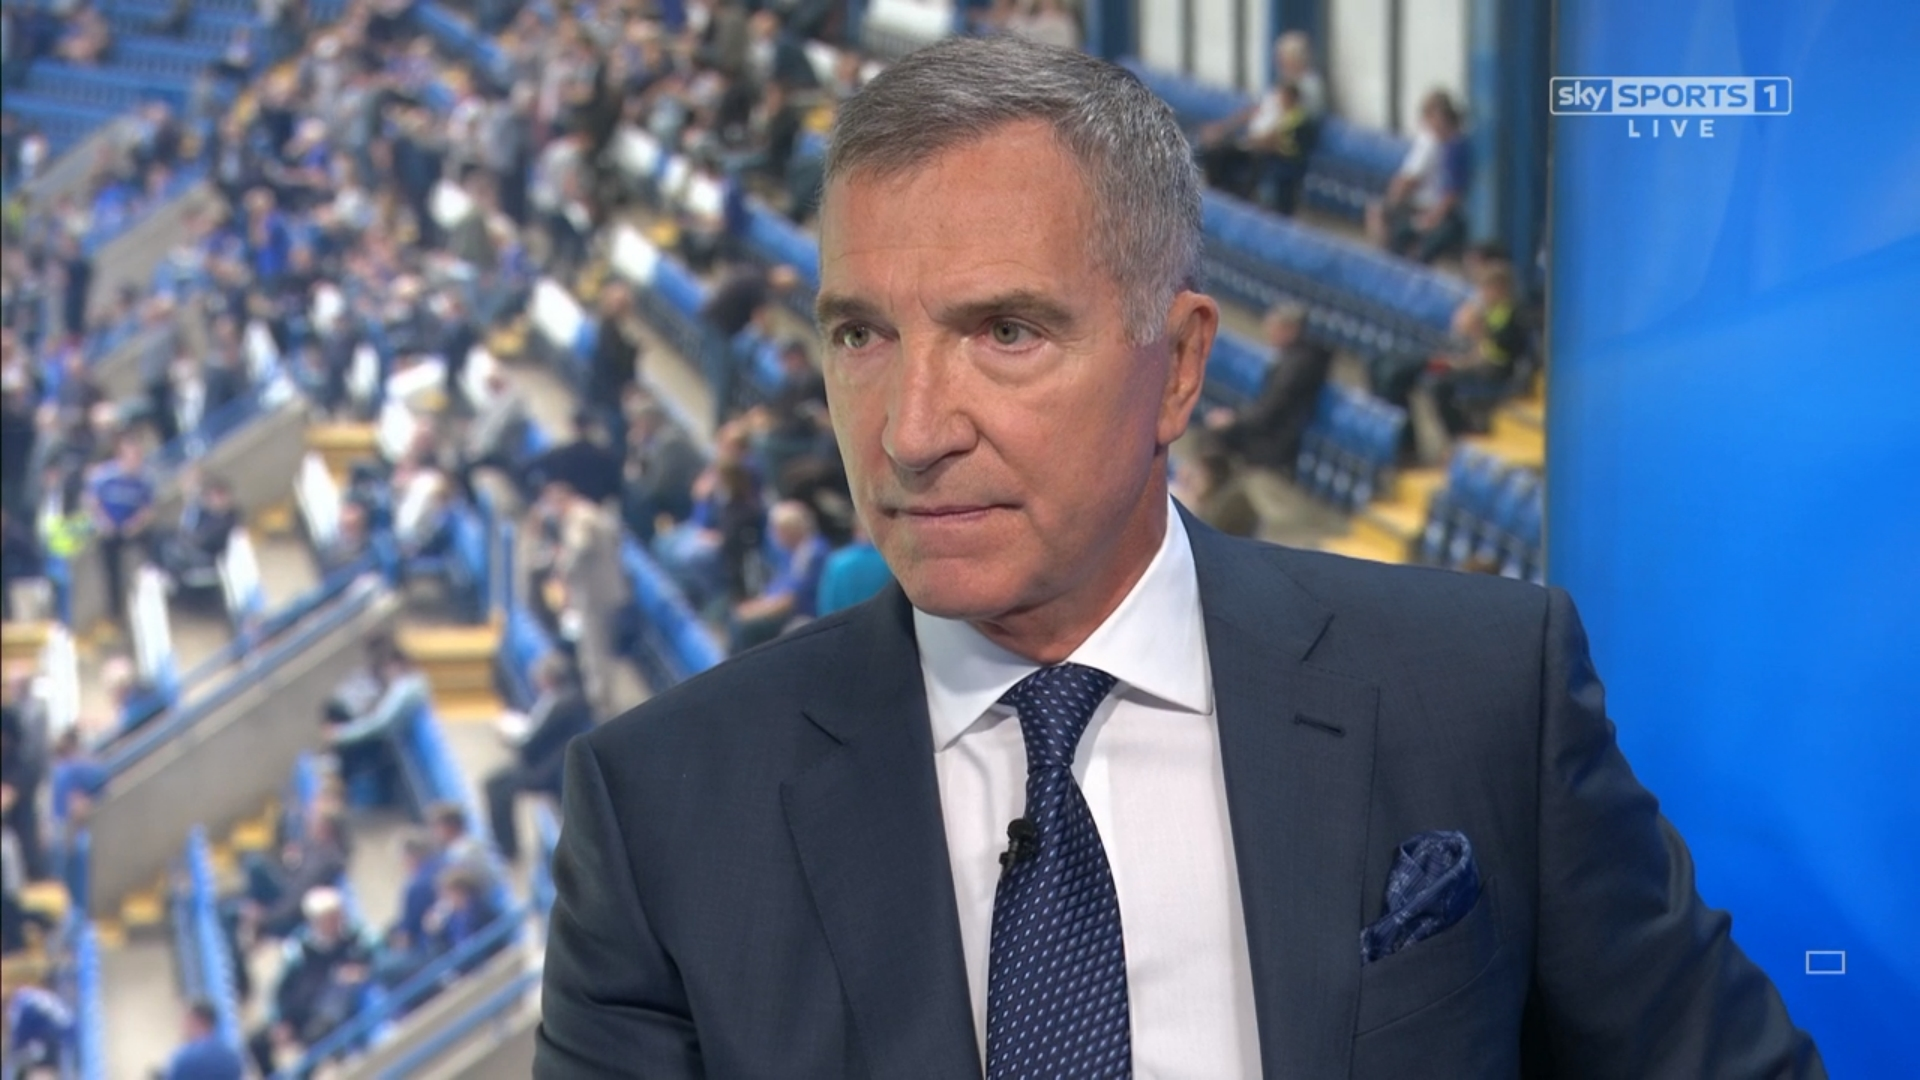 Graeme Souness - Sky Sports Football Commentator (1)